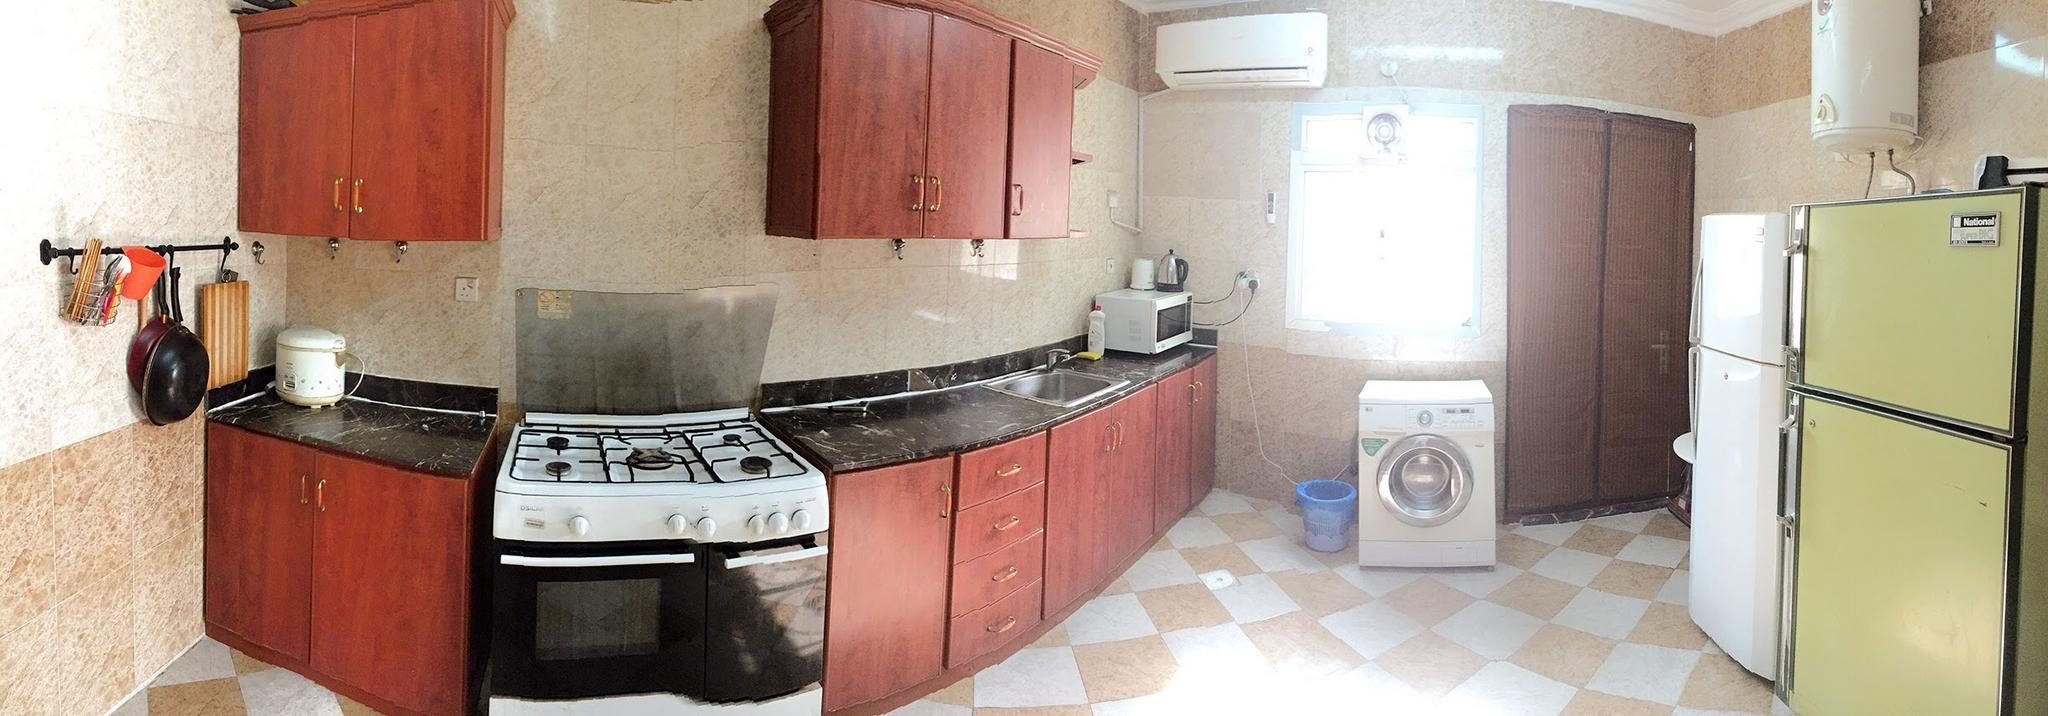 Room for single bachelor in a shared villa Ezdan Wukhir